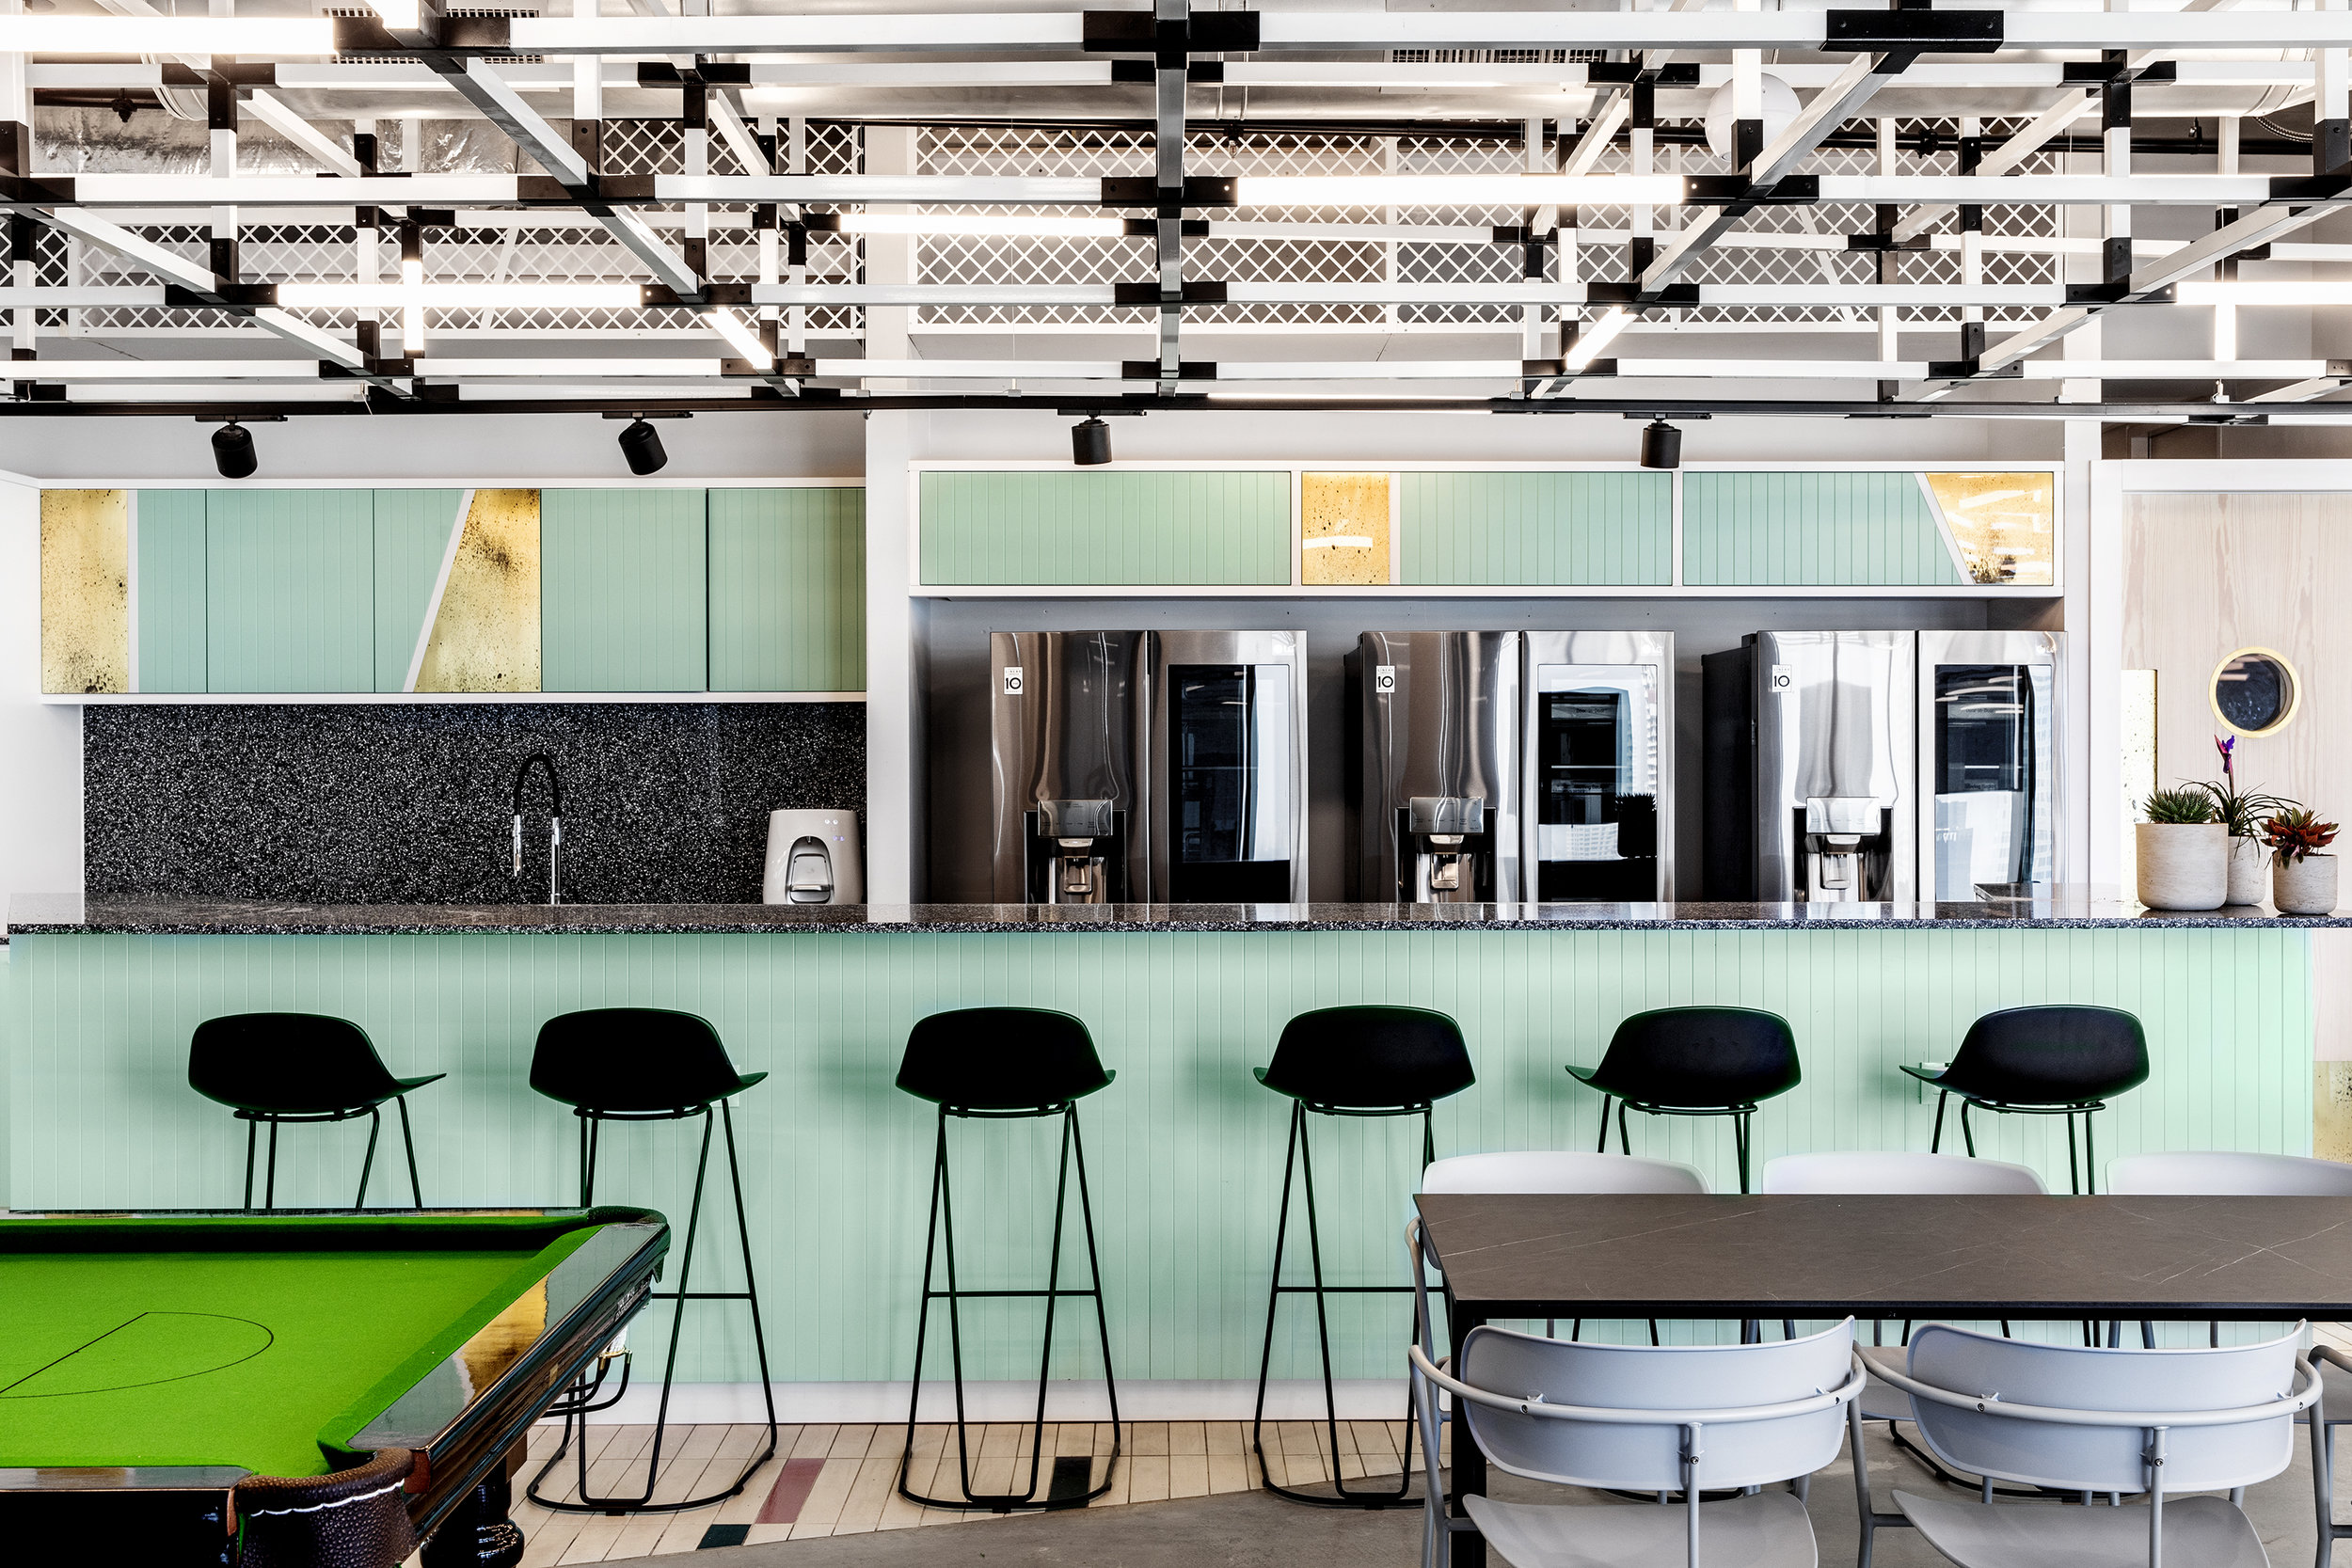 רואי דוד אדריכלות - אדריכל - נטורל אינטליג'נס - ROY DAVID - ARCHITECTURE - ARCHITECT - NI (13).jpg